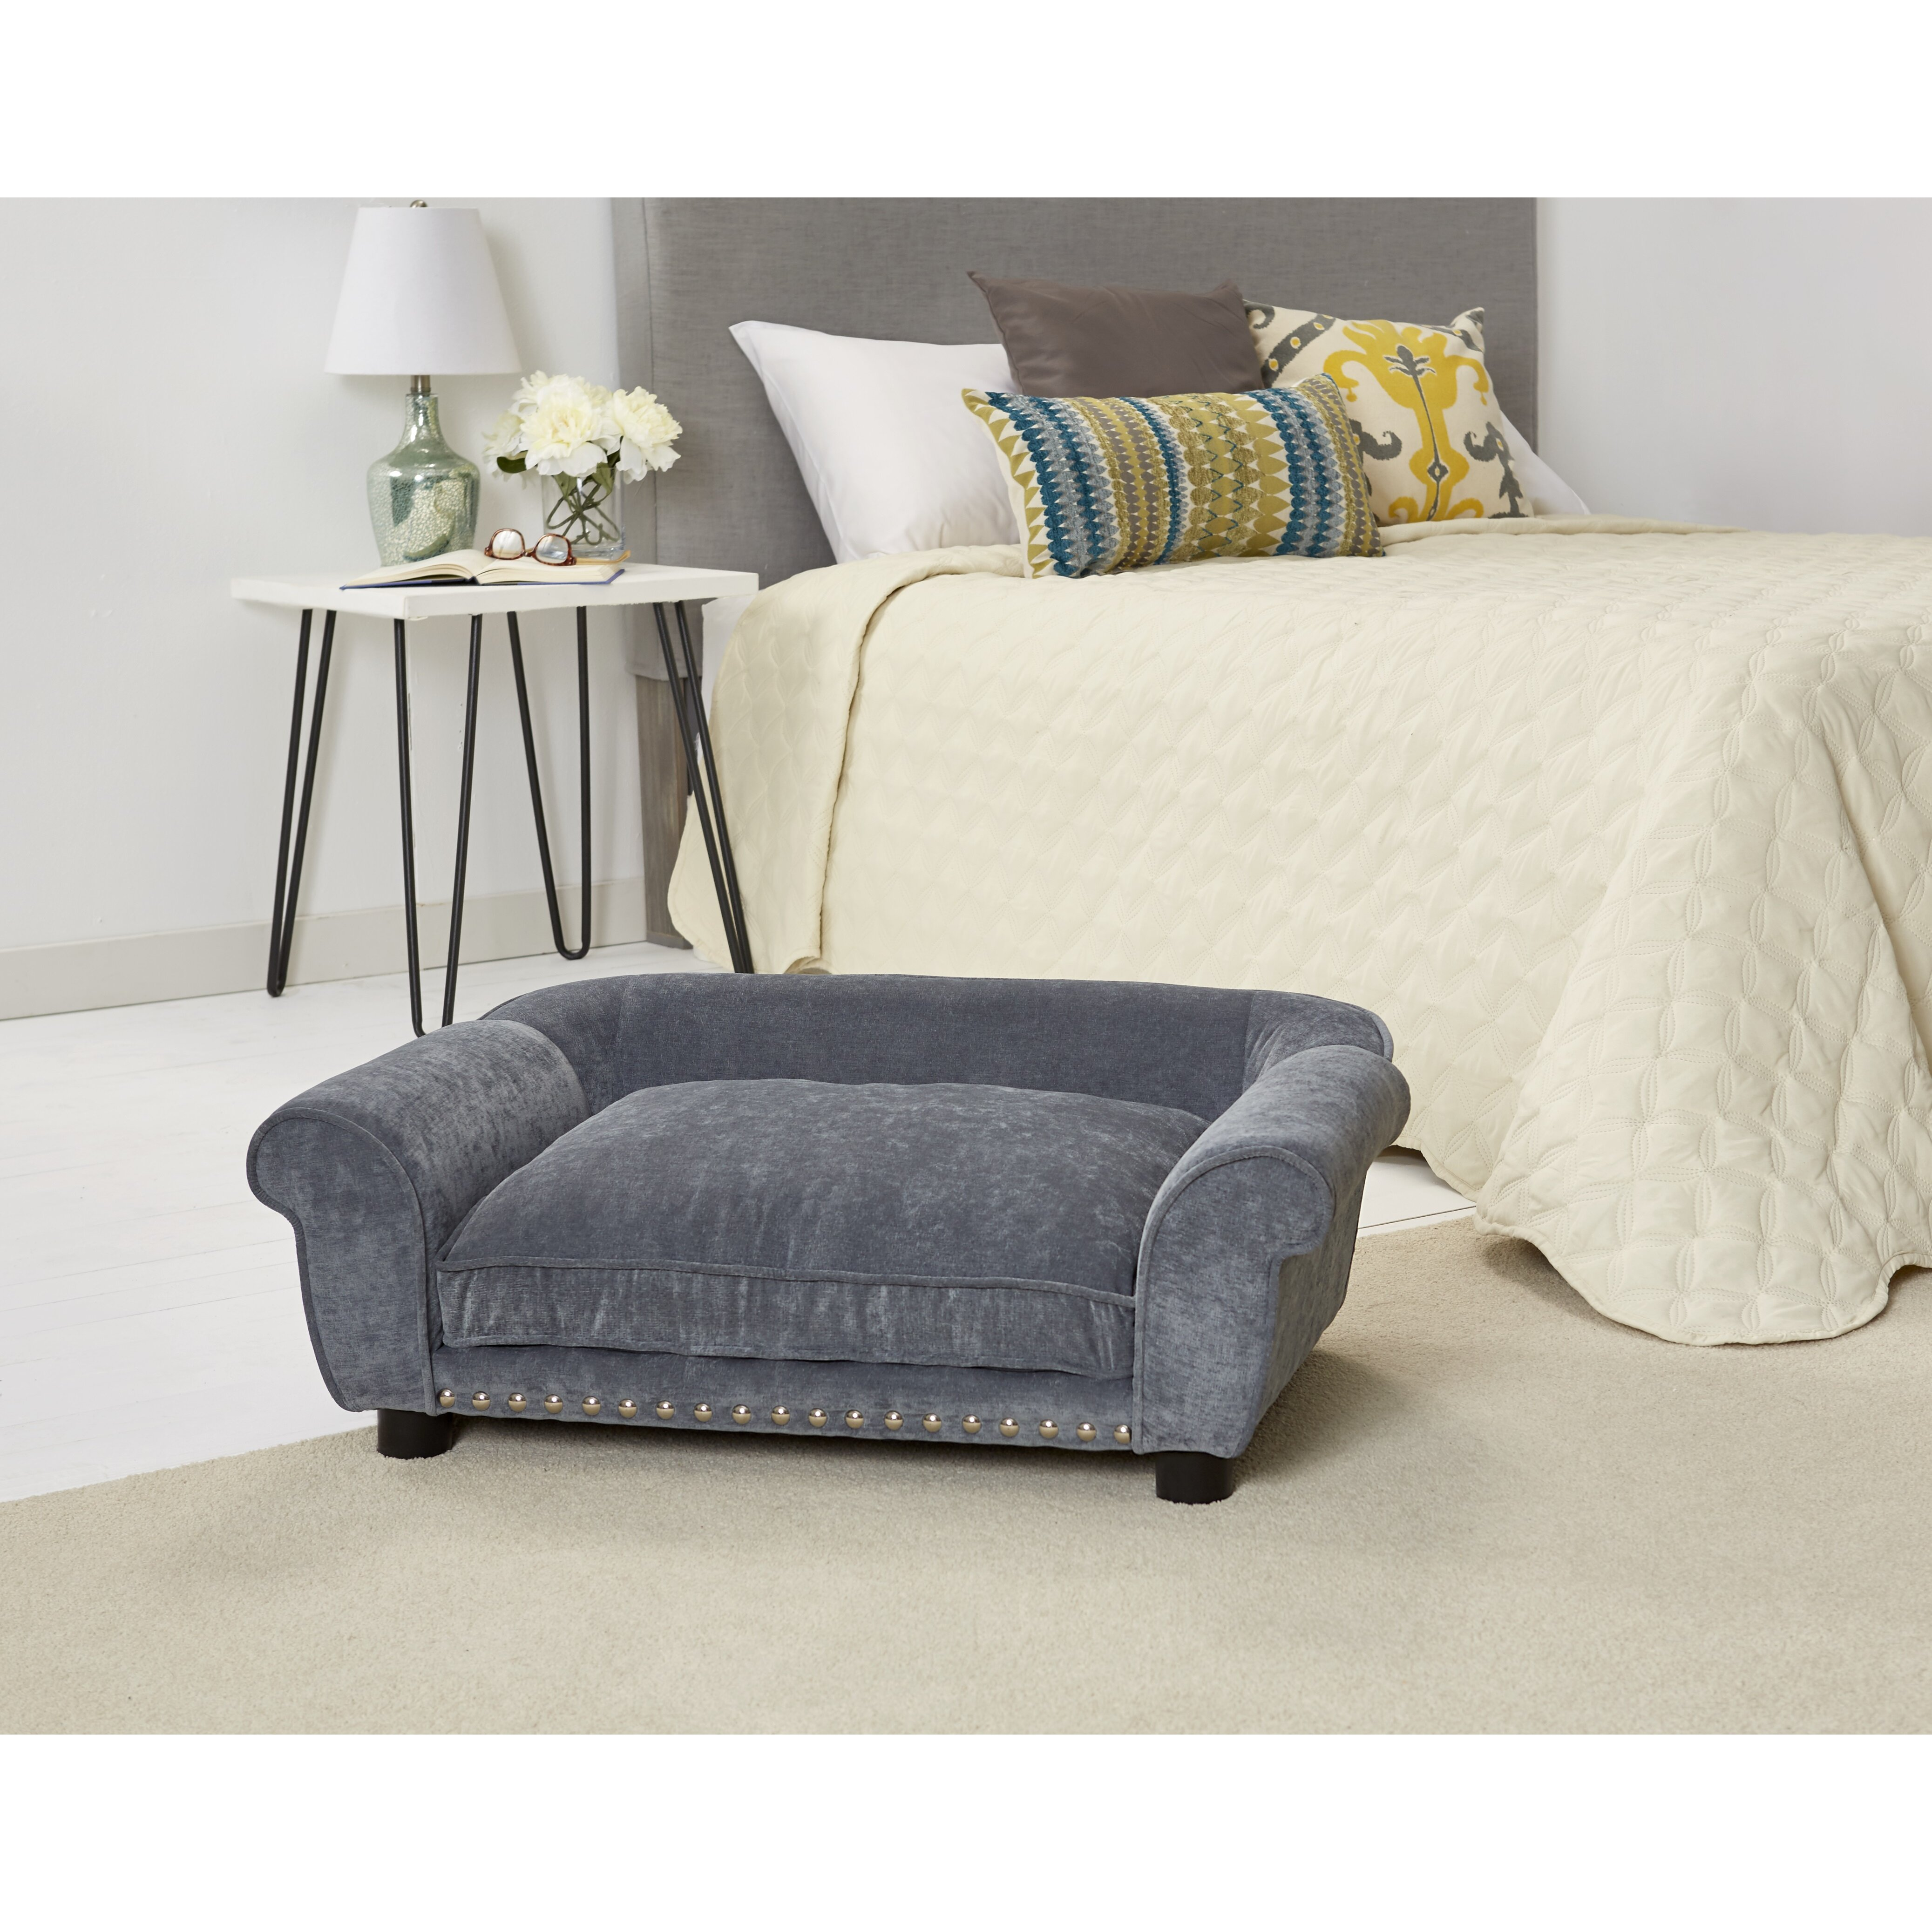 Enchanted Home Pet Dreamcatcher Velvet Dog Sofa With